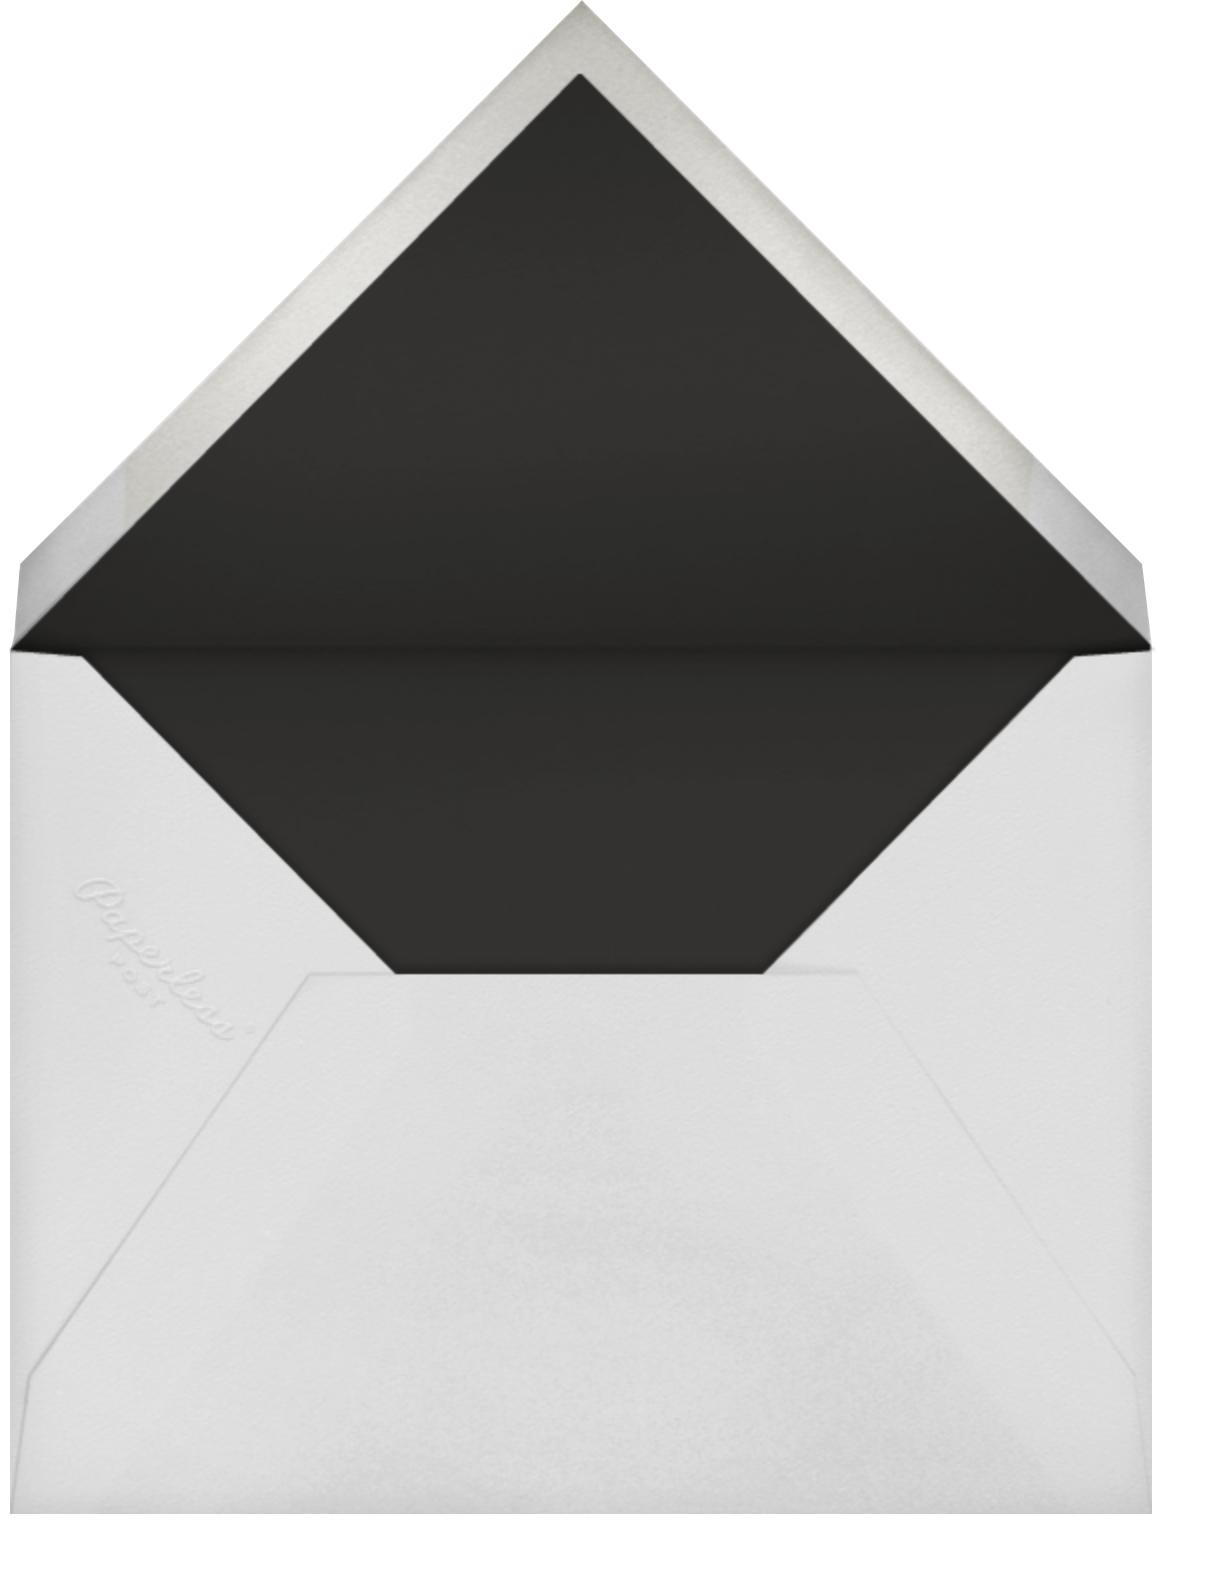 Richmond Park (Photo Invitation) - Silver - Oscar de la Renta - All - envelope back